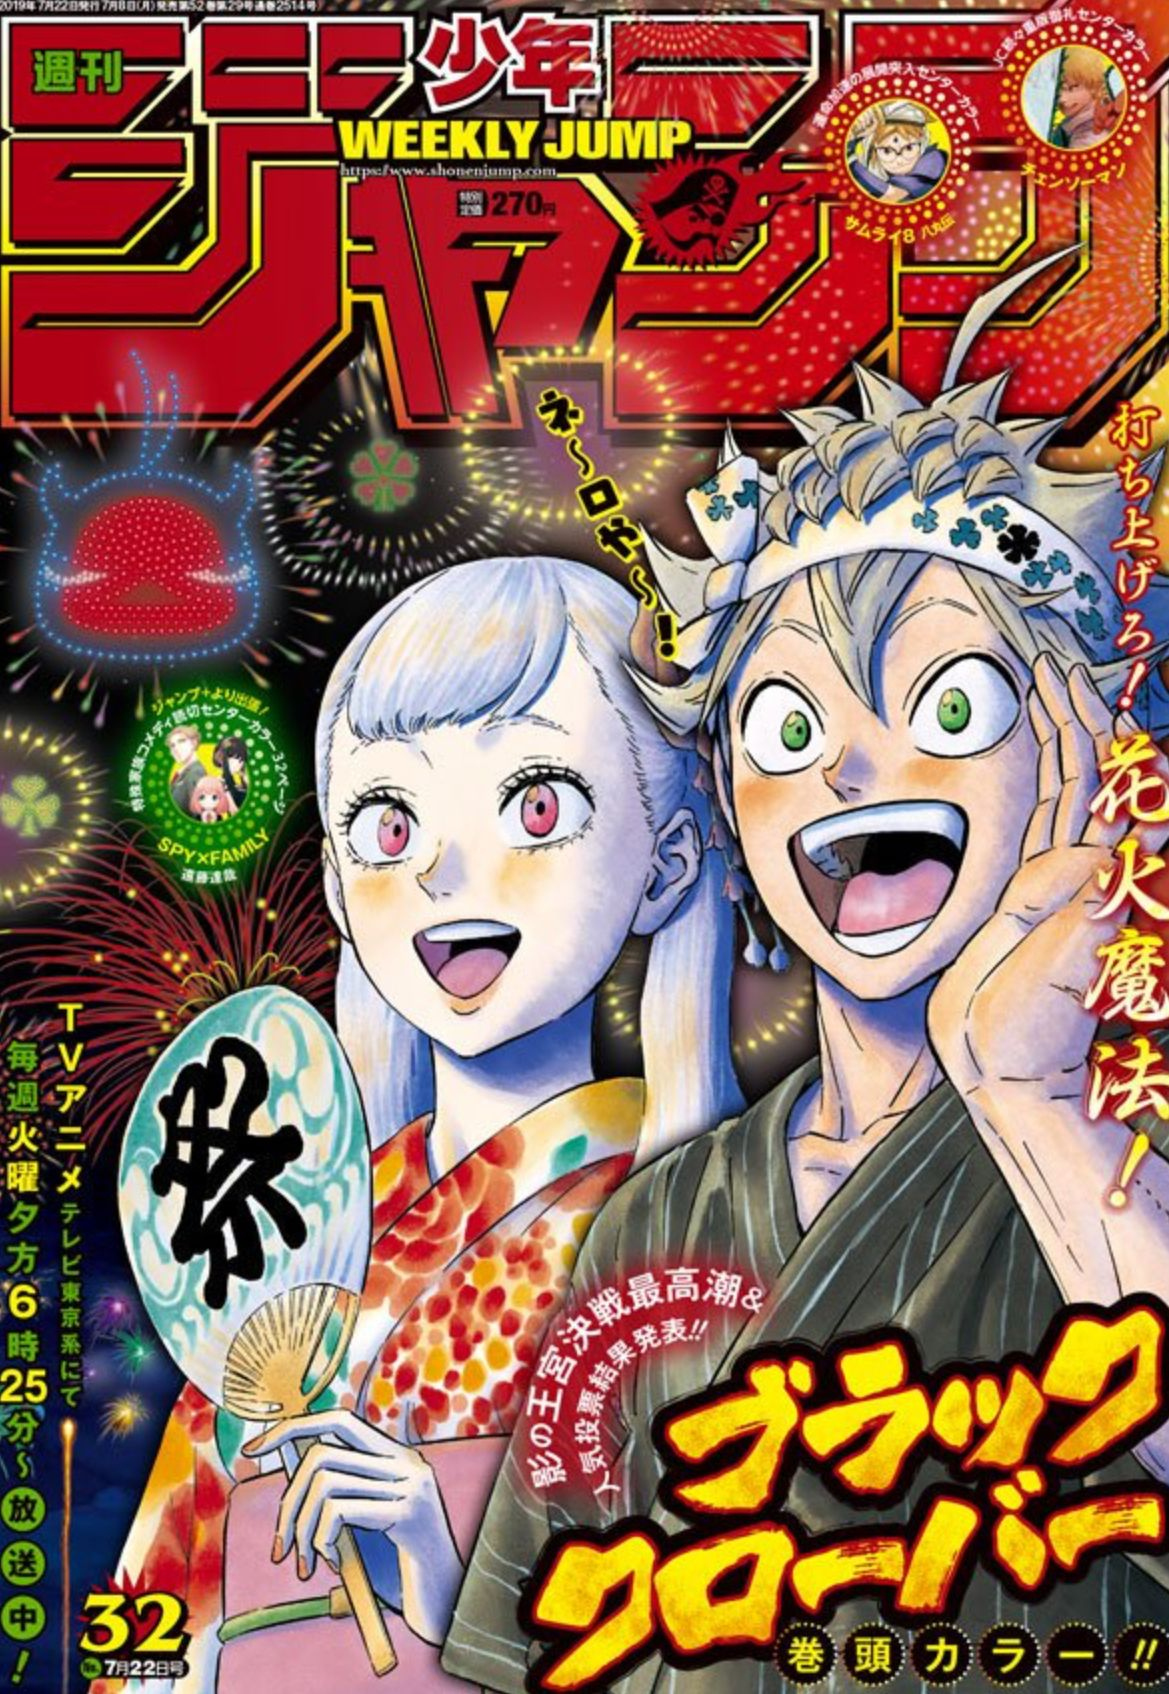 pin by ananda julianti on black clover anime wall art black clover anime japanese poster design